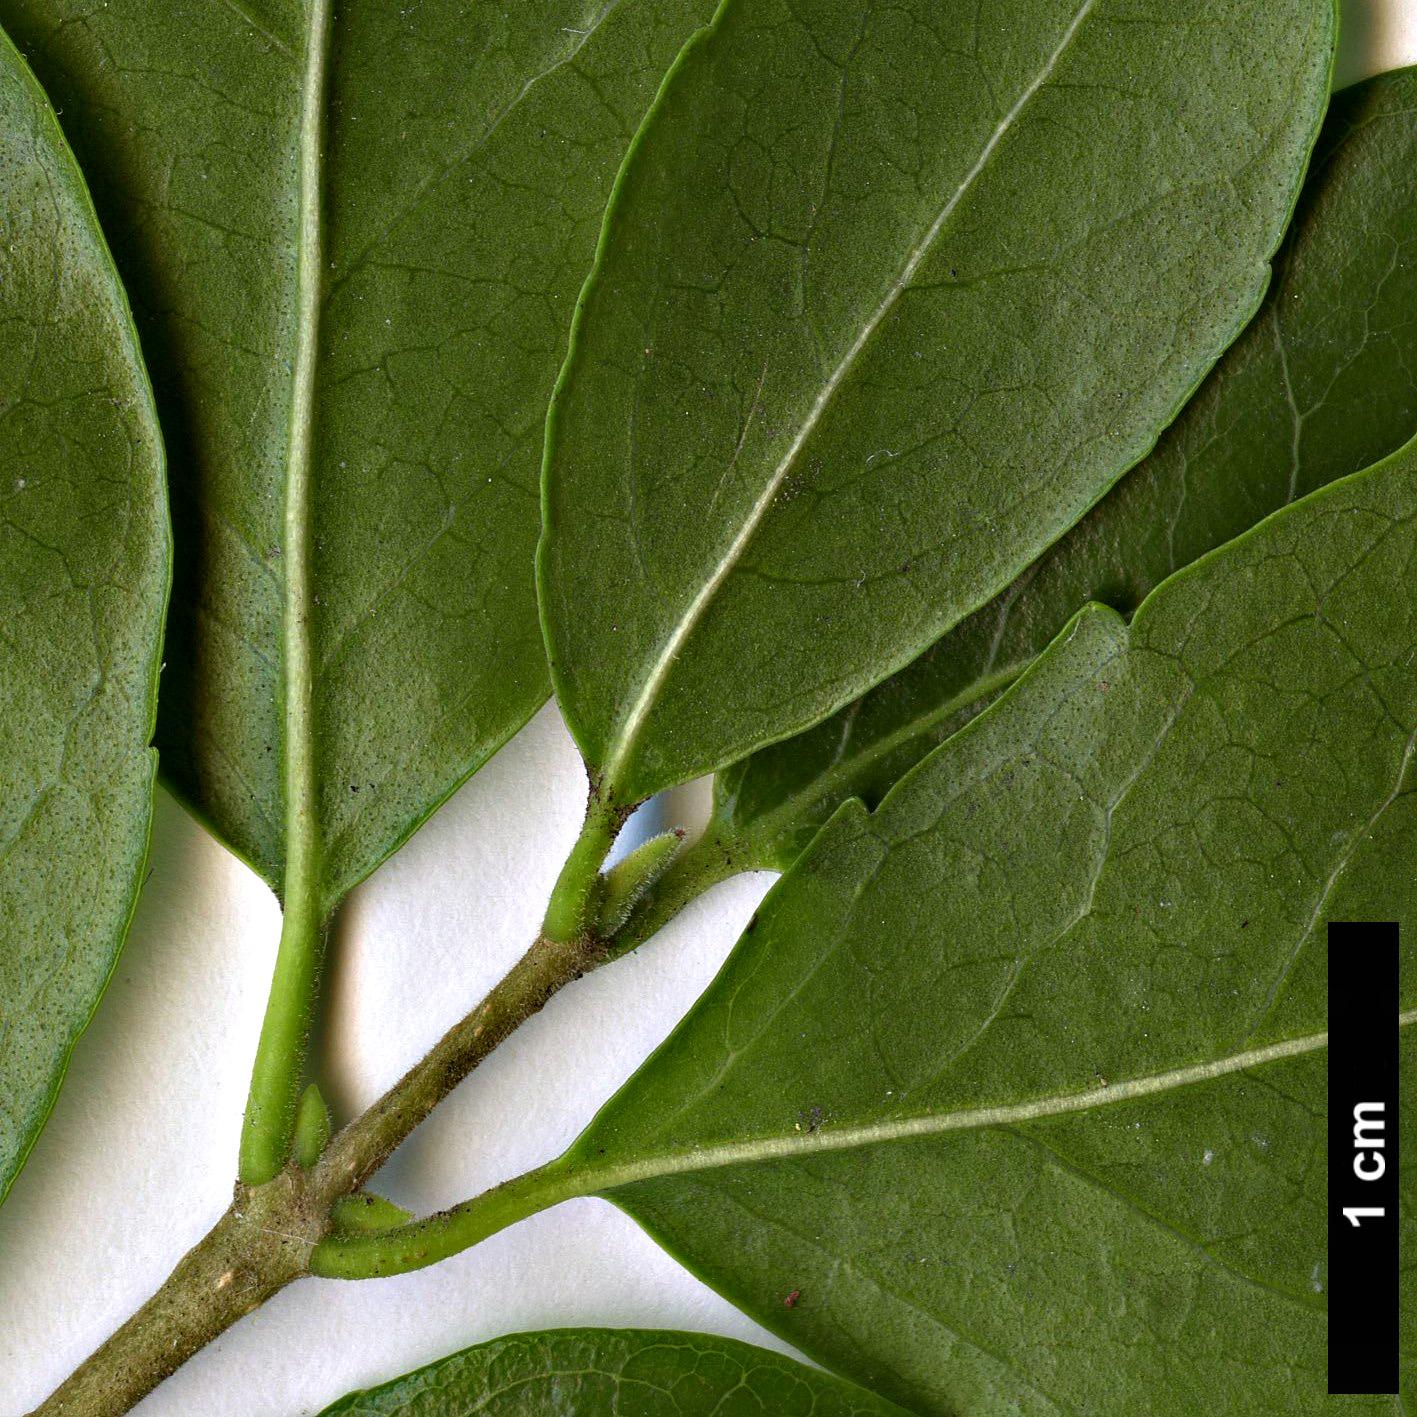 Family Oleaceae Genus Phillyrea Specy latifolia